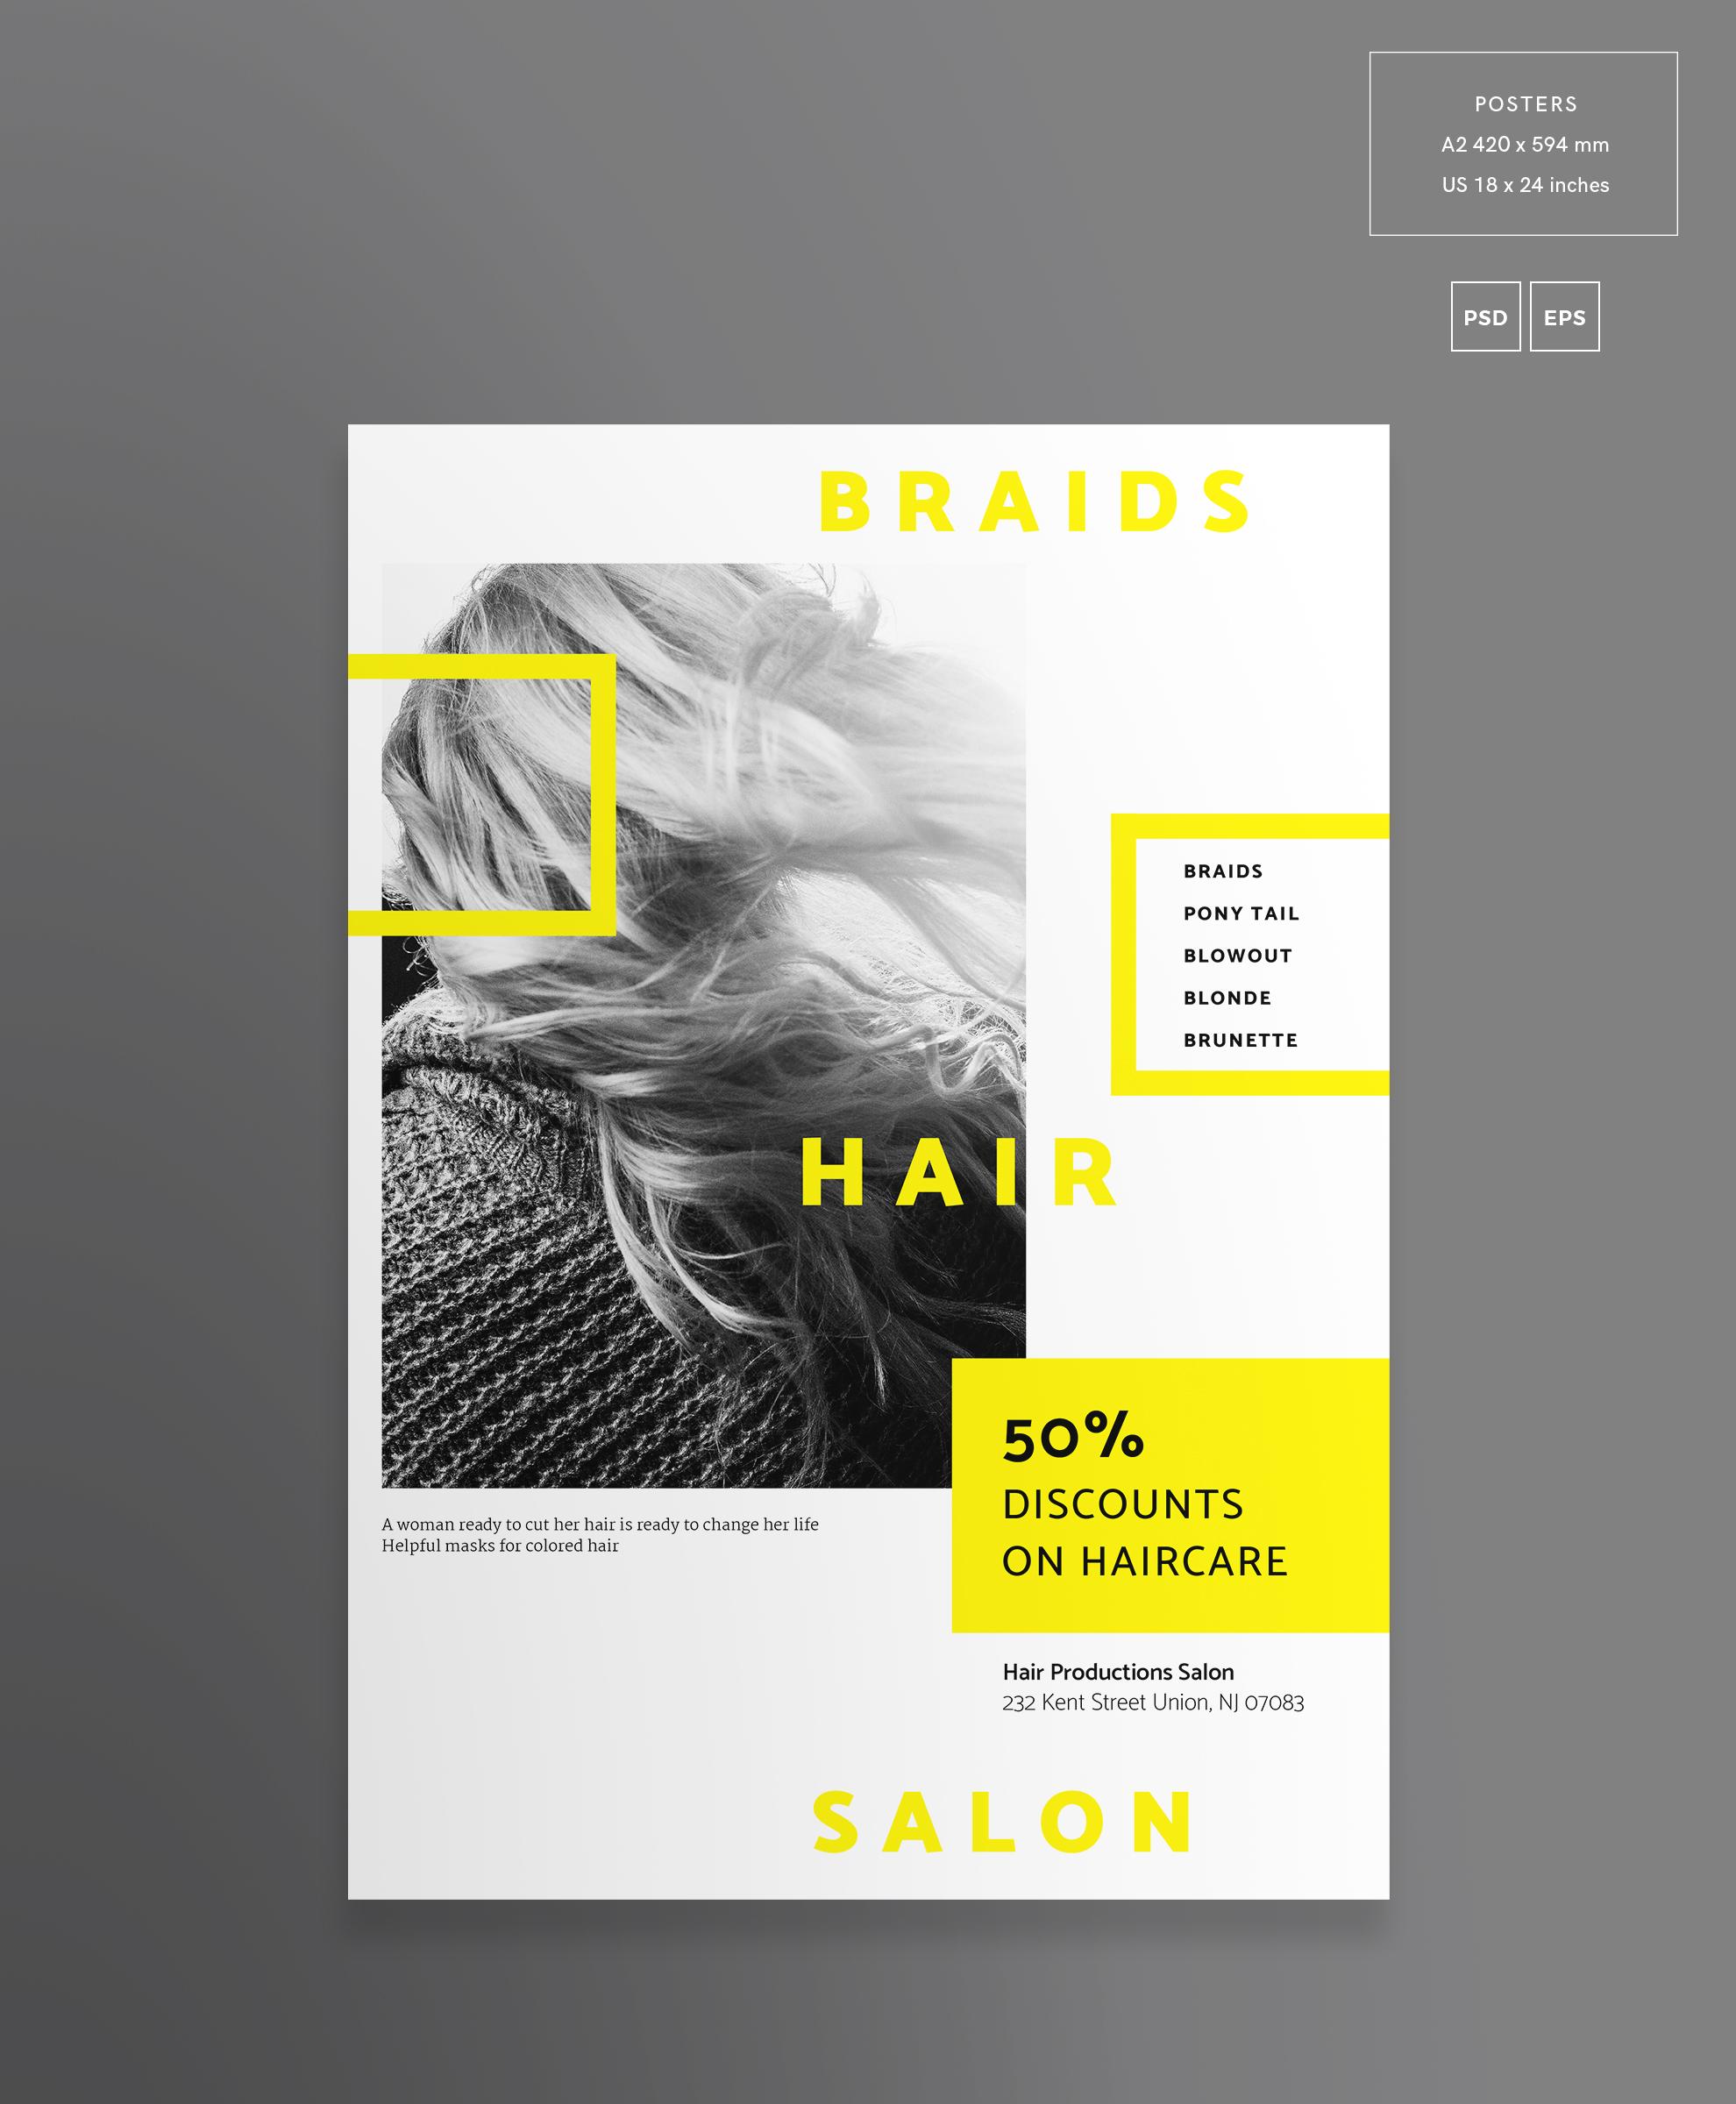 Hair Salon Barbershop Design Templates Bundle example image 9